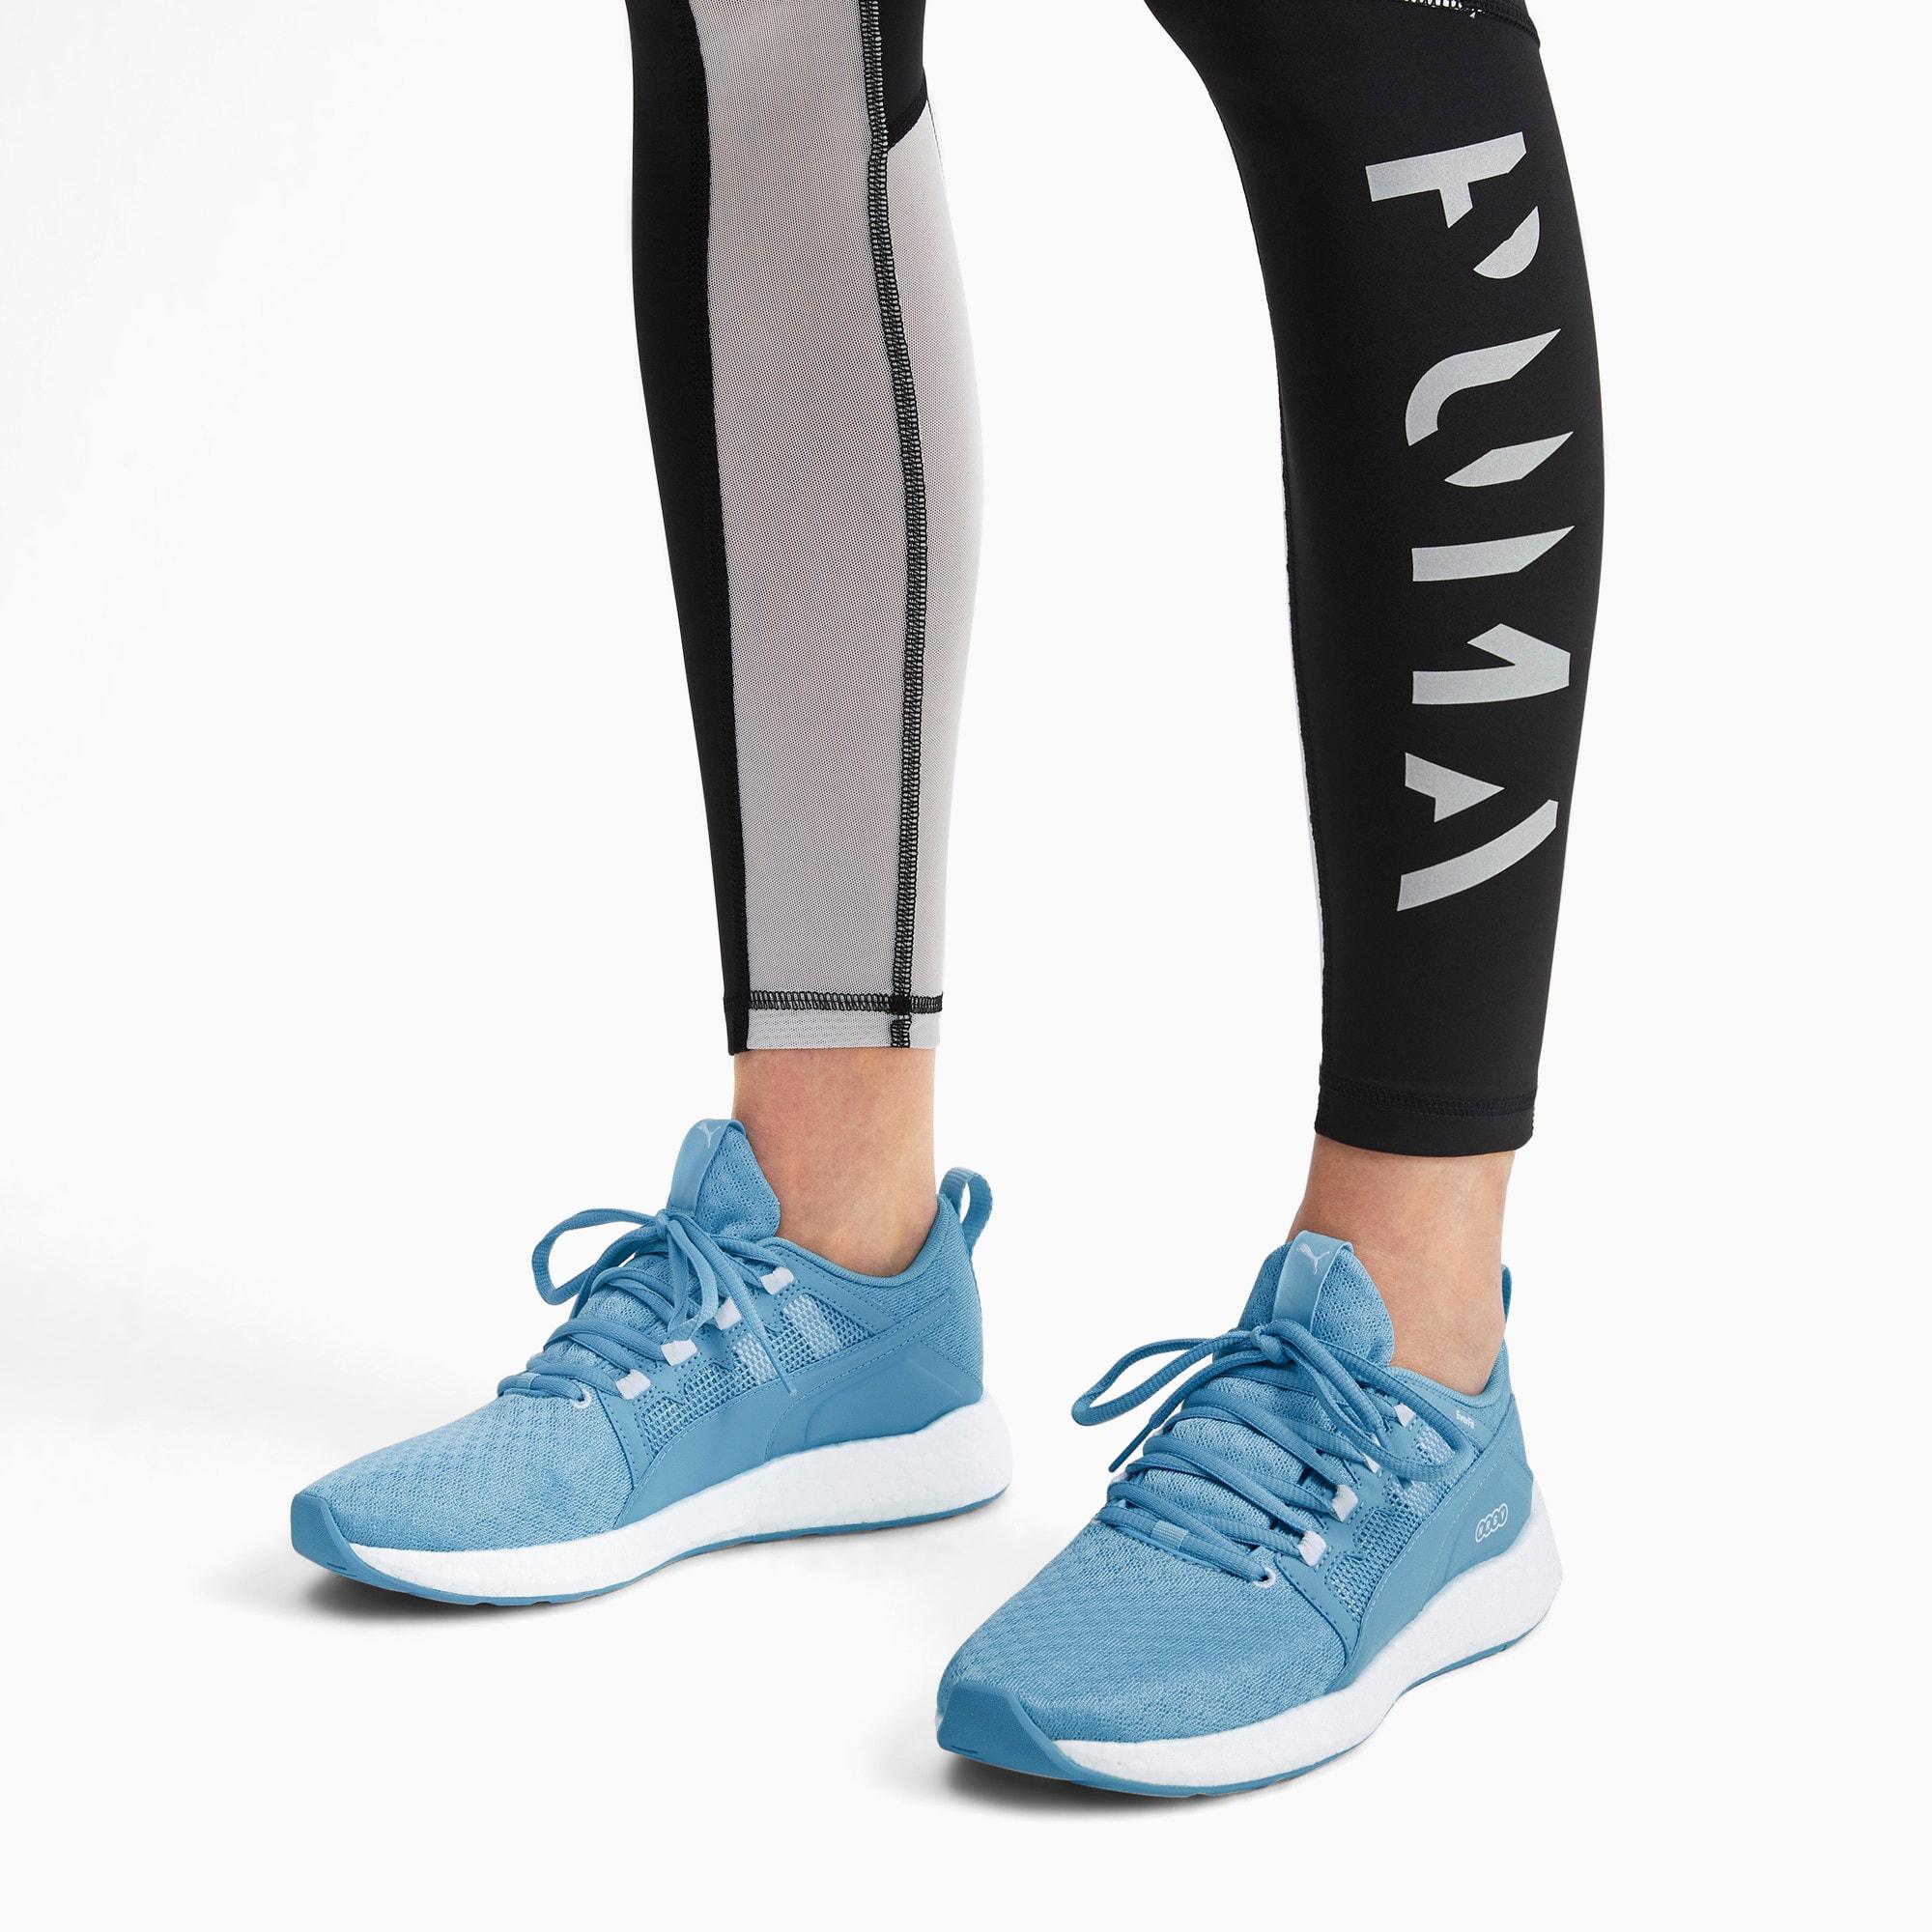 Thumbnail 2 of NRGY Neko Turbo Women's Trainers, Milky Blue-Puma White, medium-IND